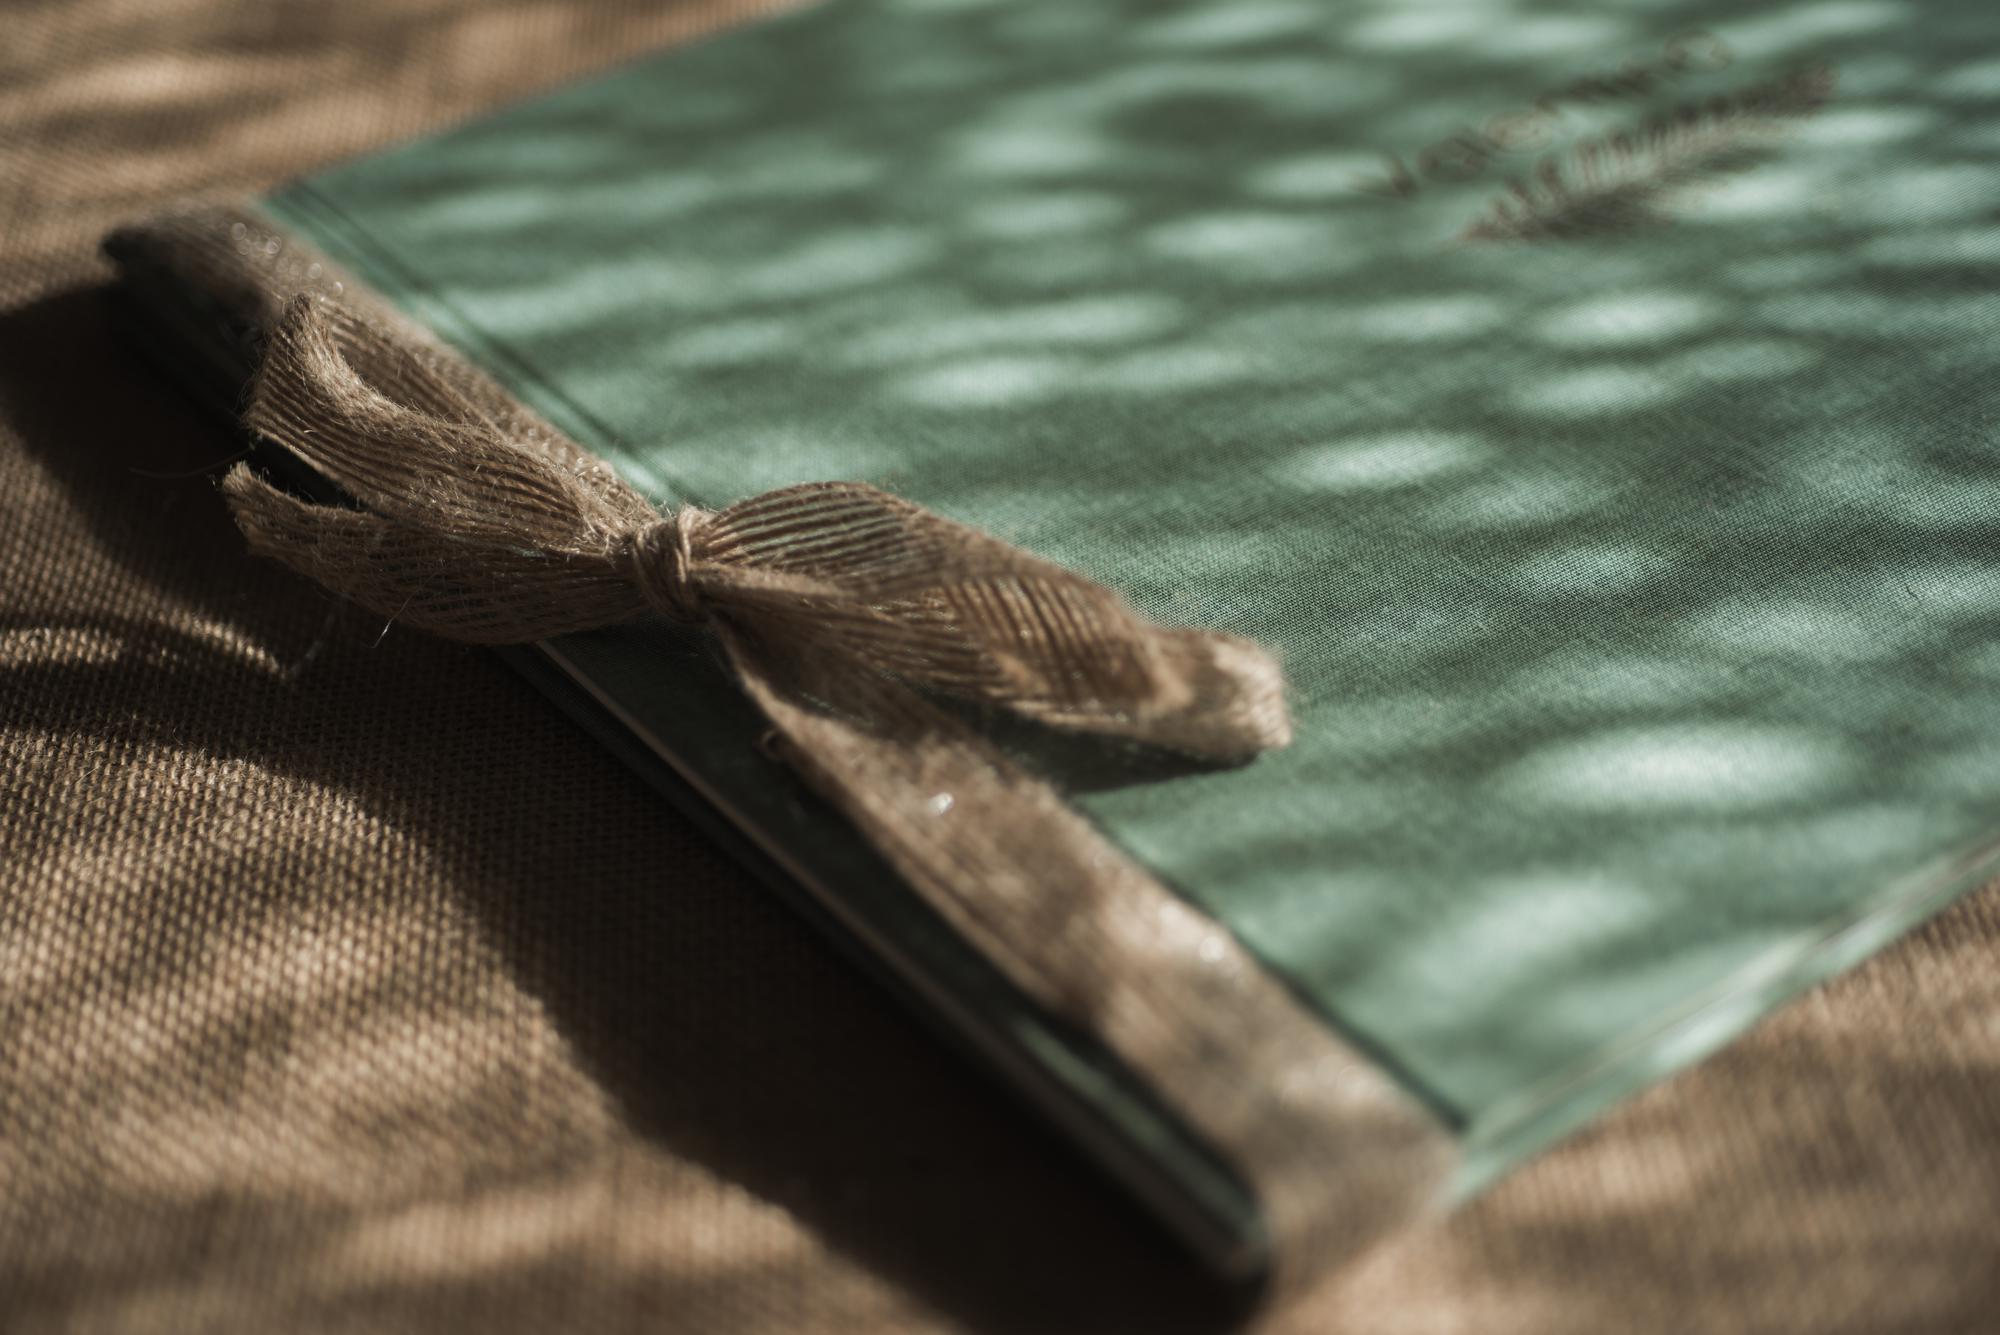 Carpeta en verde jaspeado con lazo de lino natural